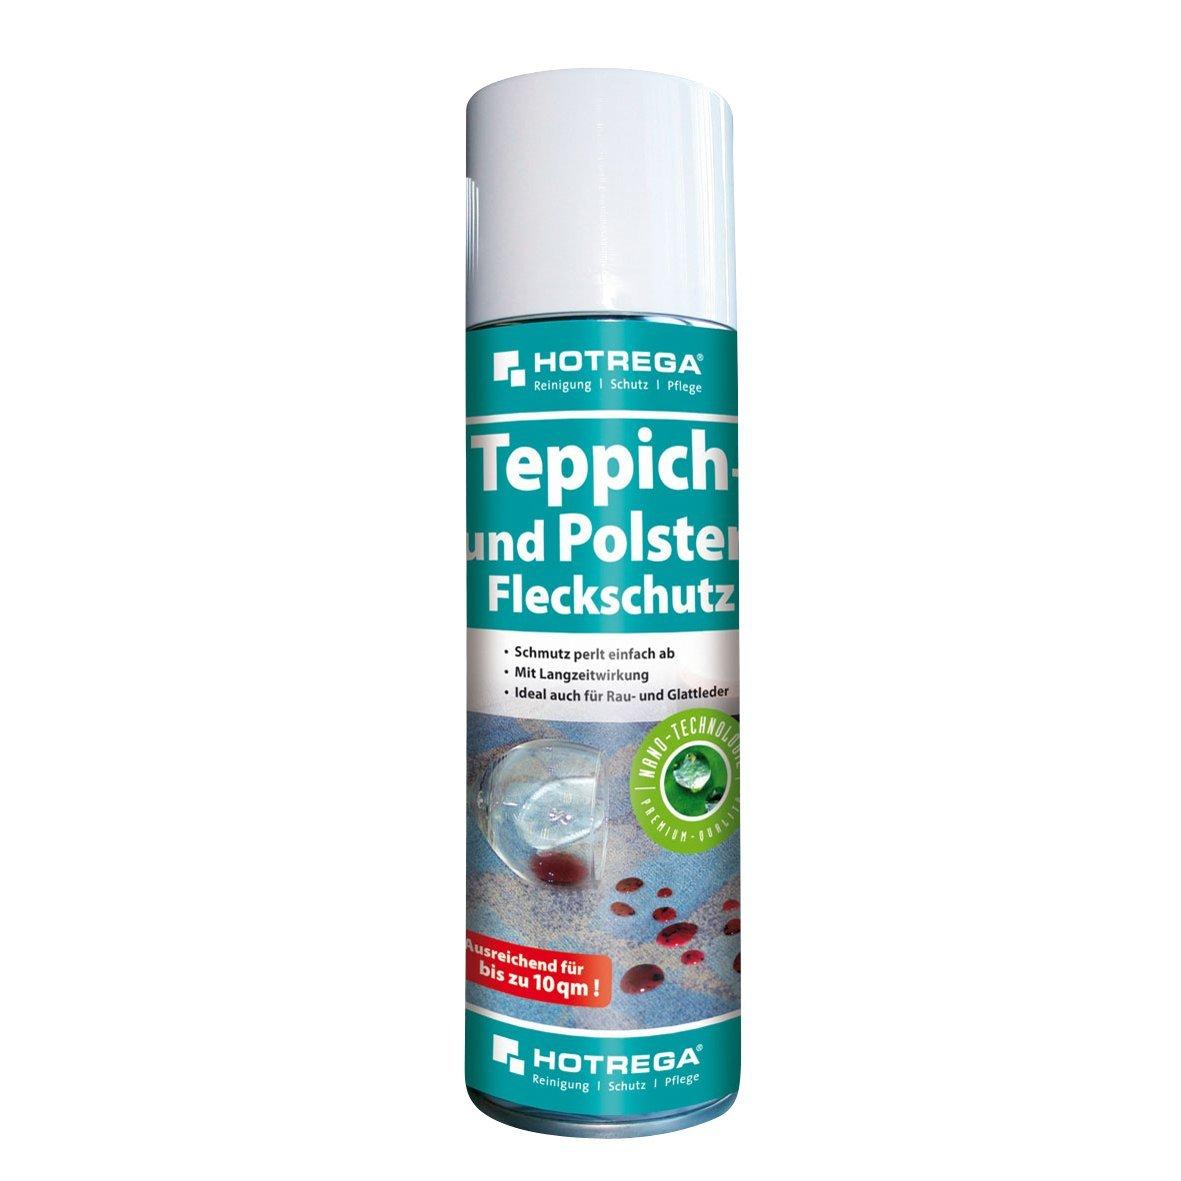 Hotrega H230070 Teppich- und Polster-Fleckschutz, Antihaft ...